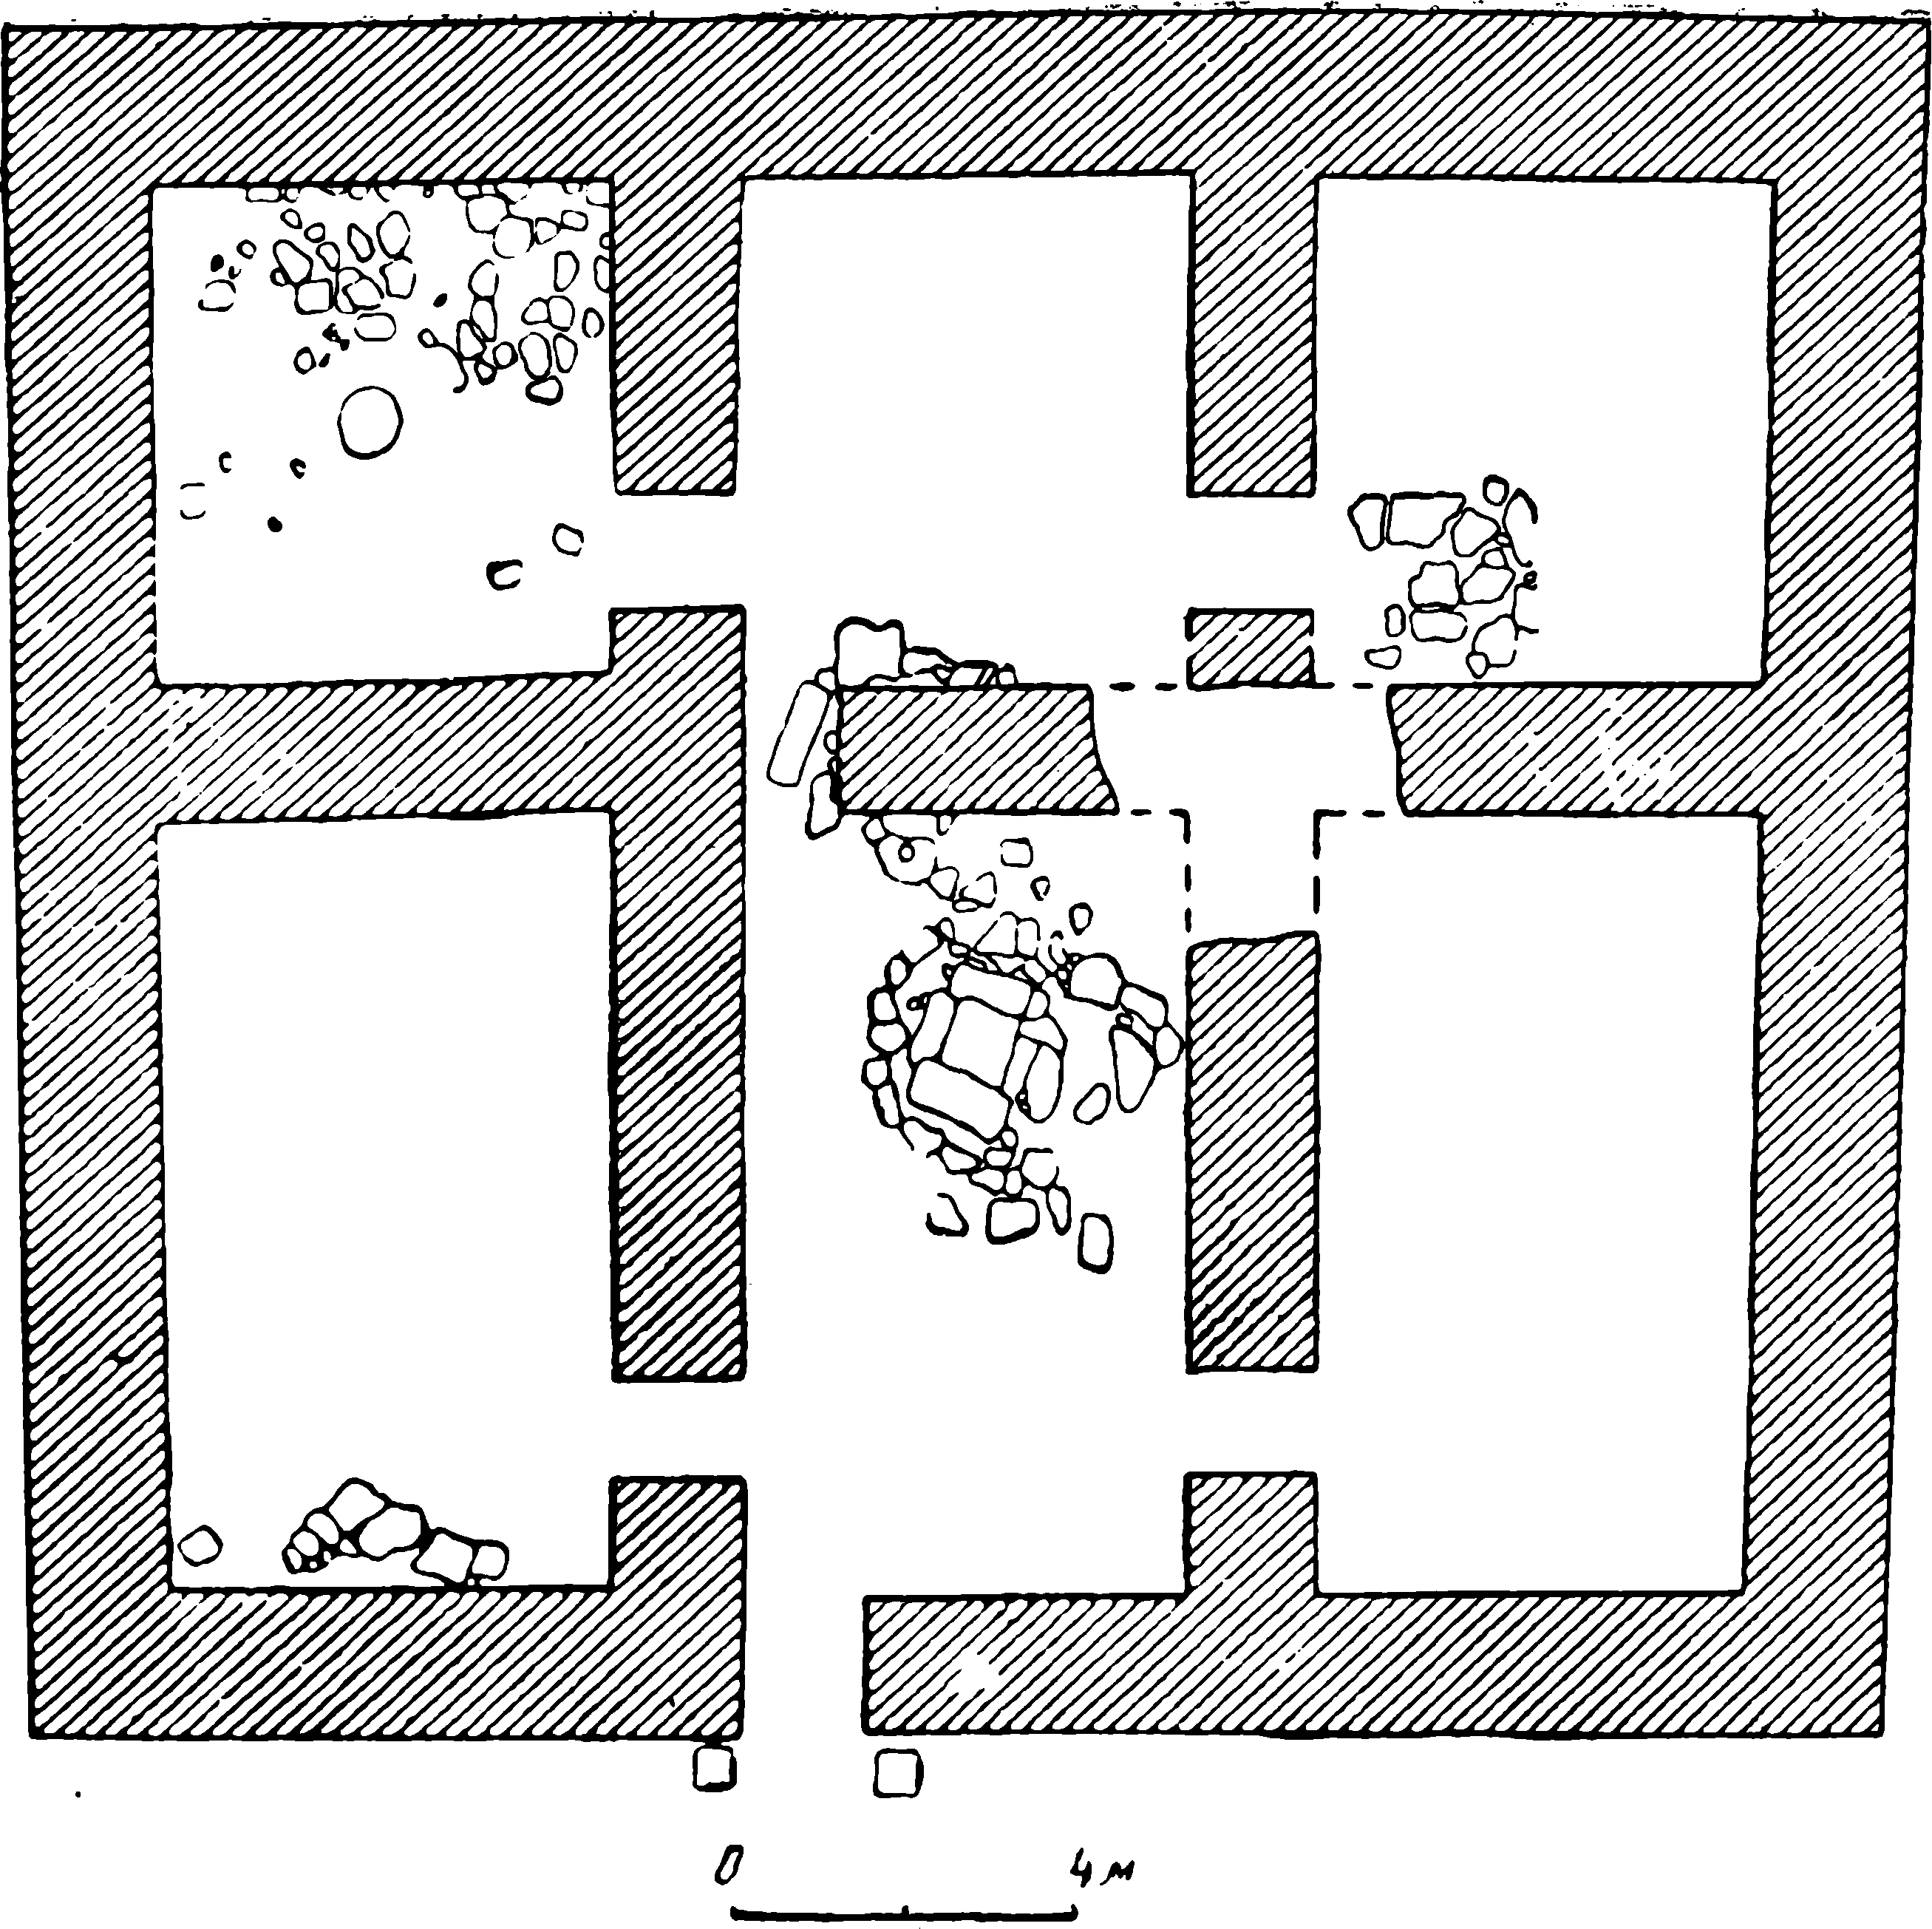 ap-102